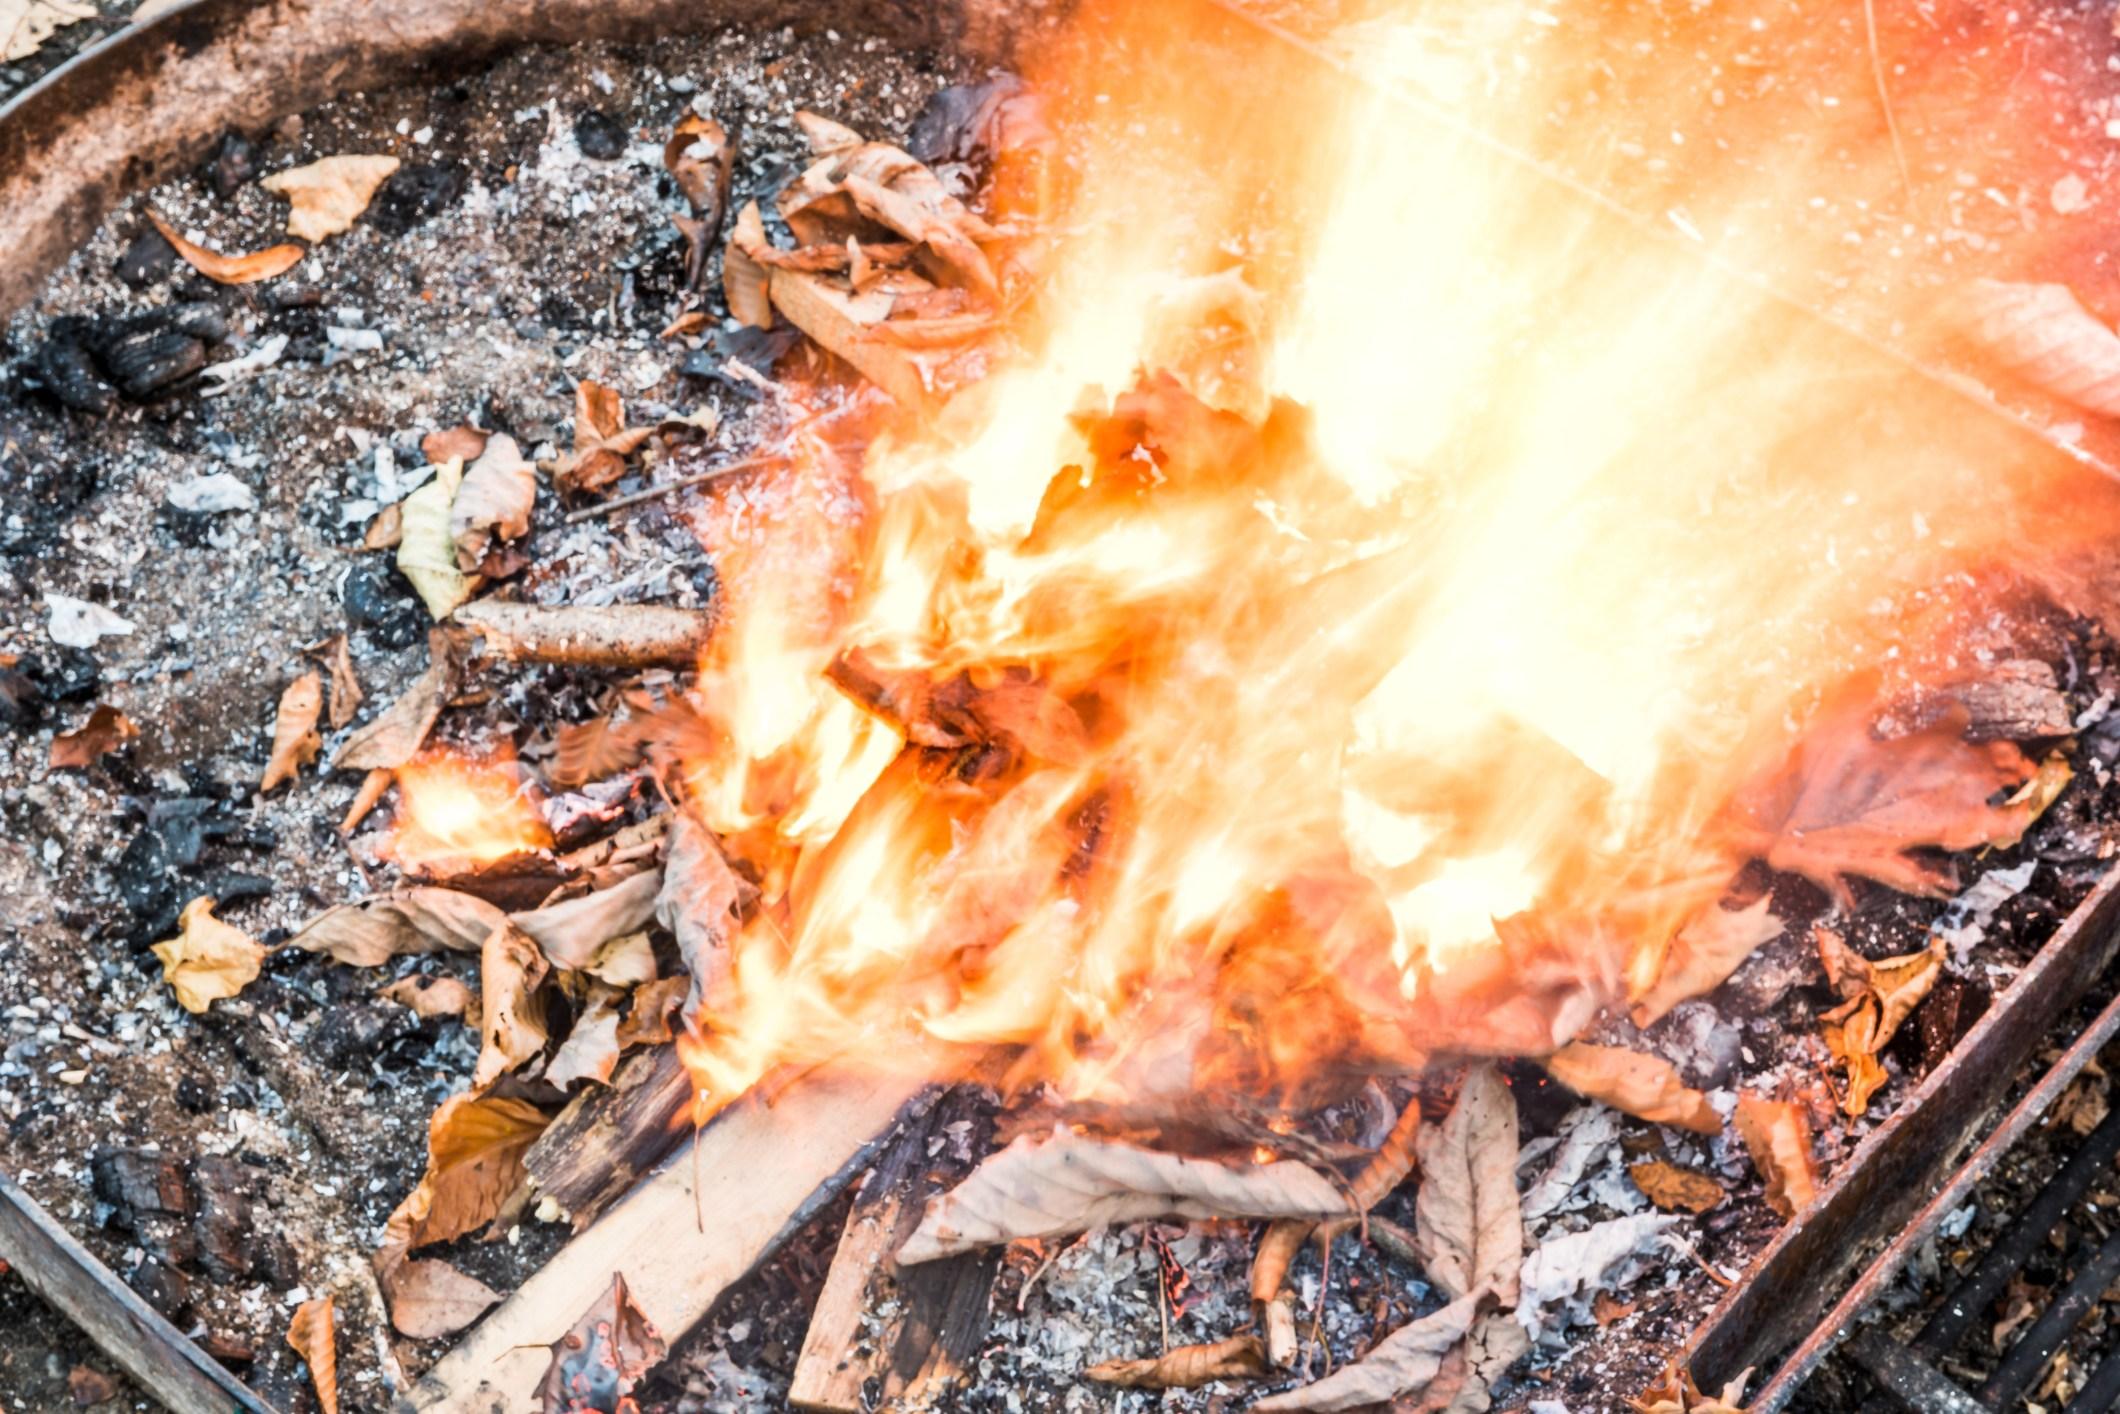 High flame